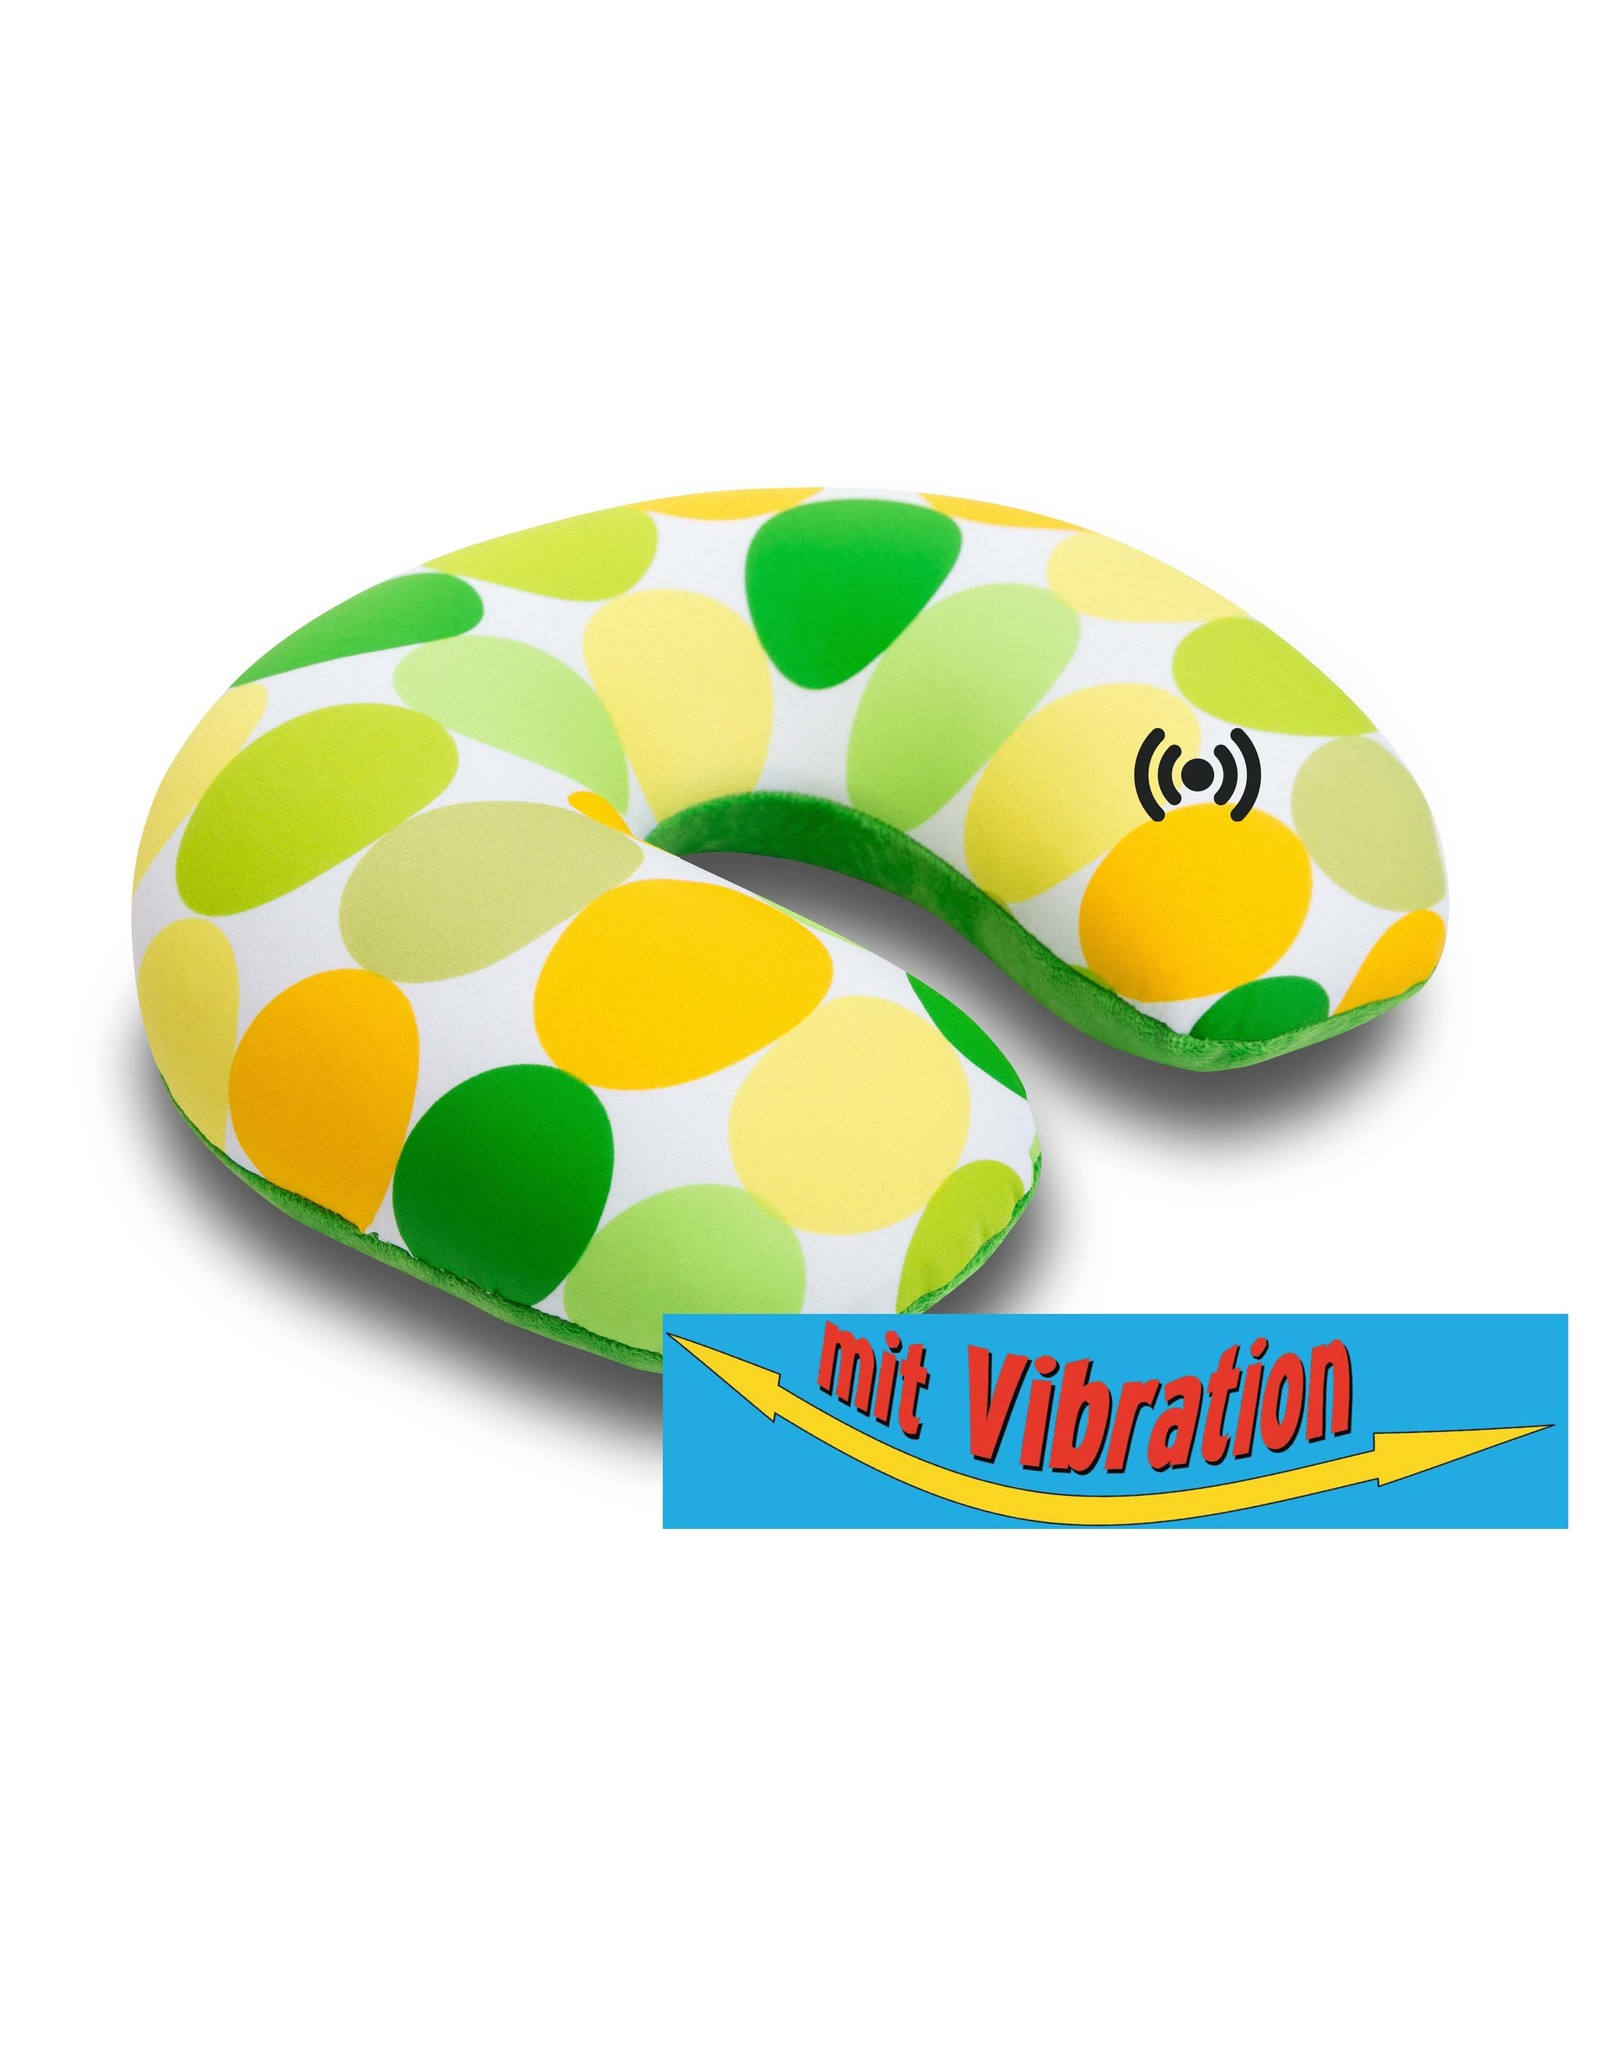 Kuschel-Maxx Kuschel-Maxx - Nackenhörnchen Punkte Gelb -Vibration